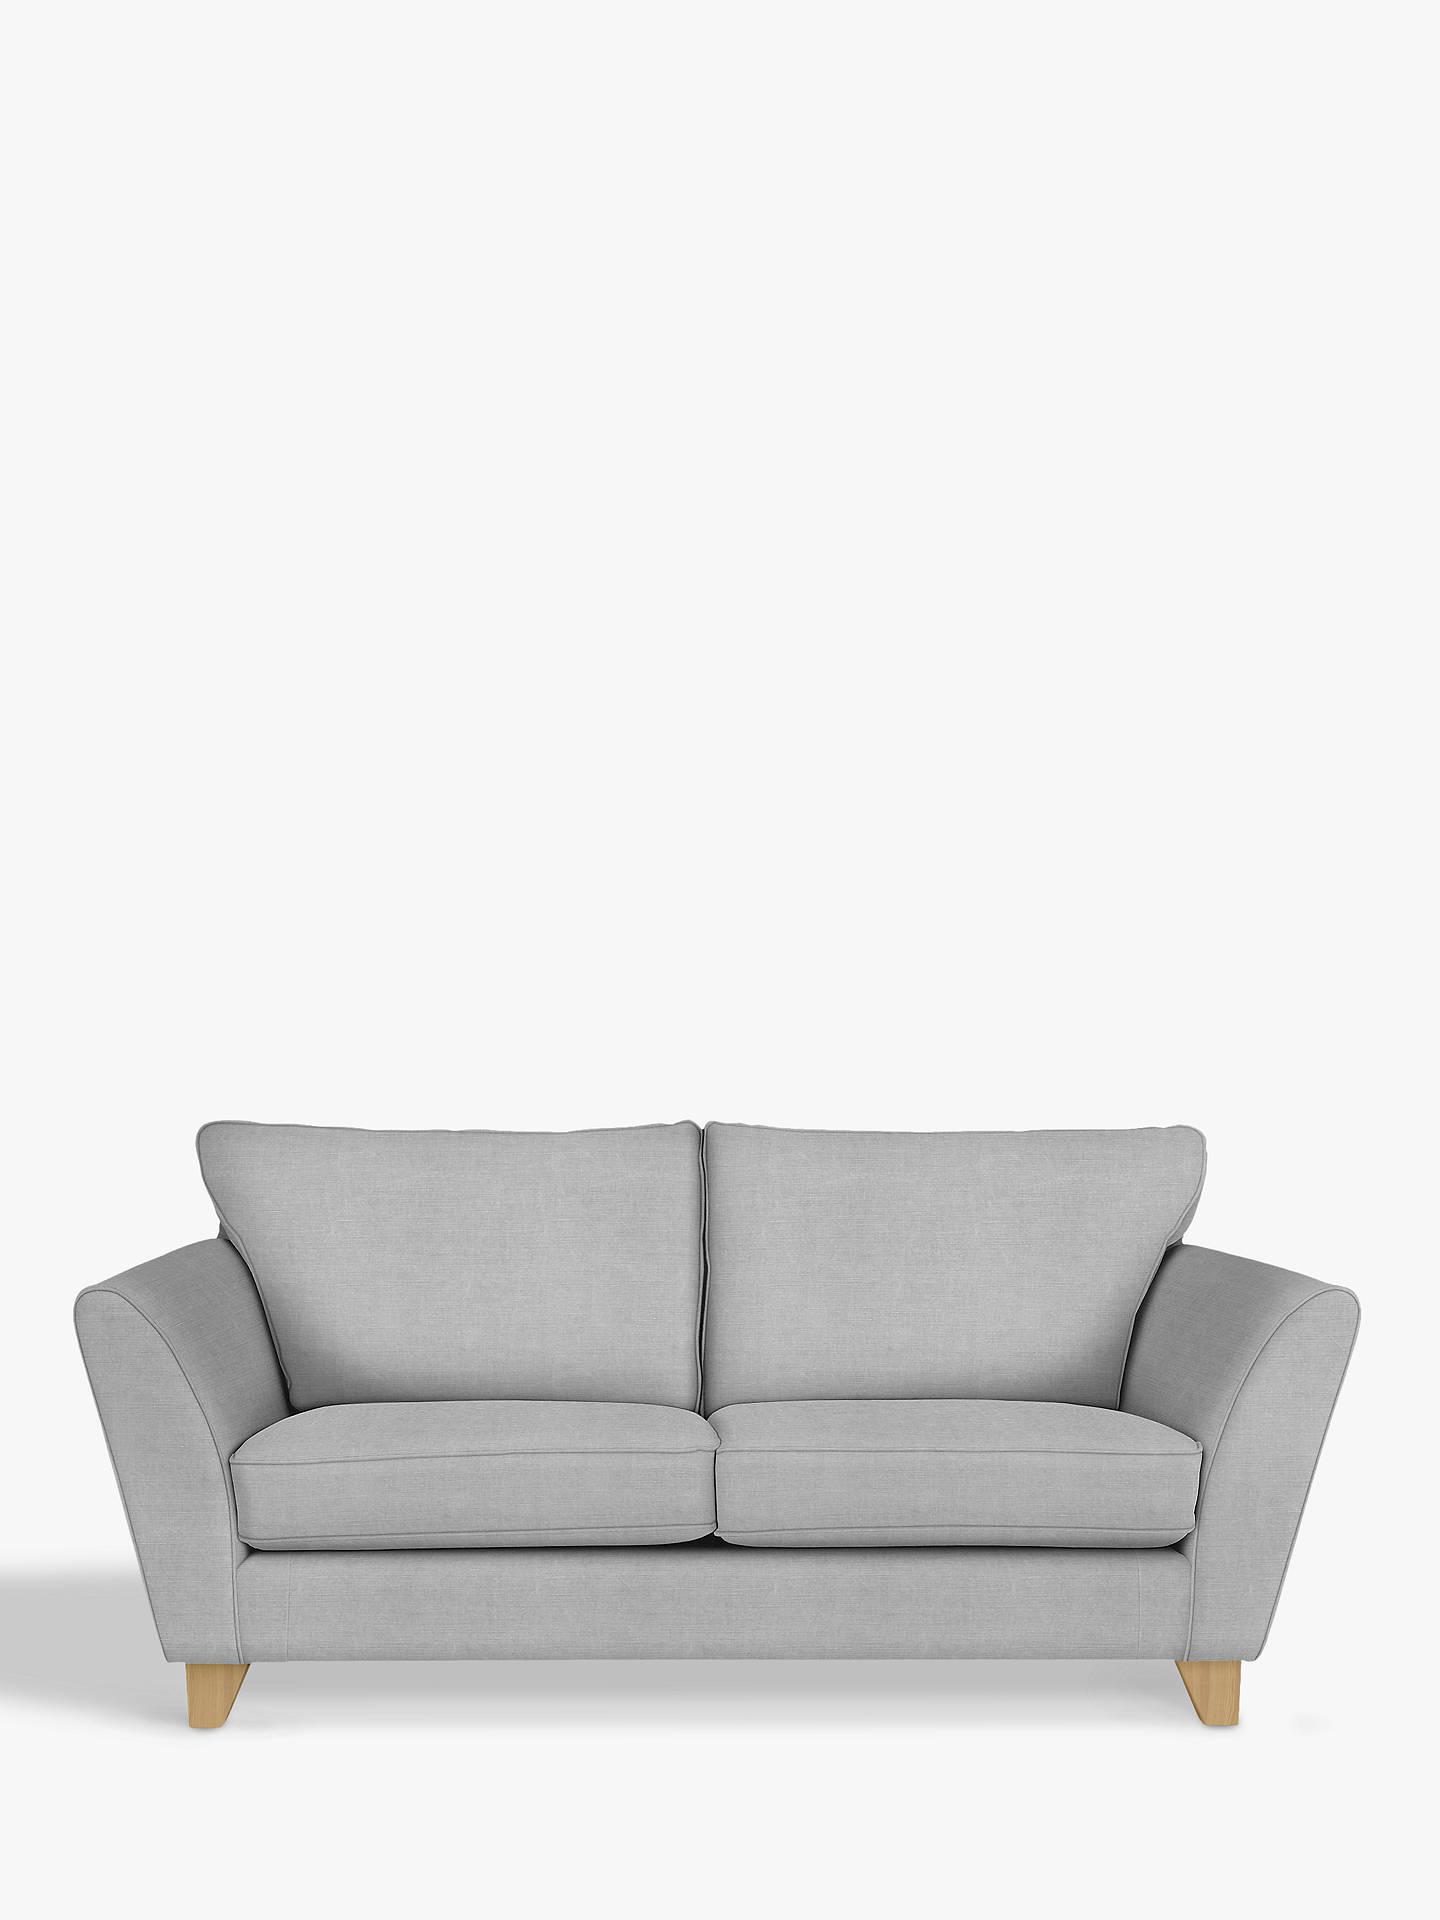 Stilig John Lewis & Partners Oslo Medium 2 Seater Sofa at John Lewis SO-39